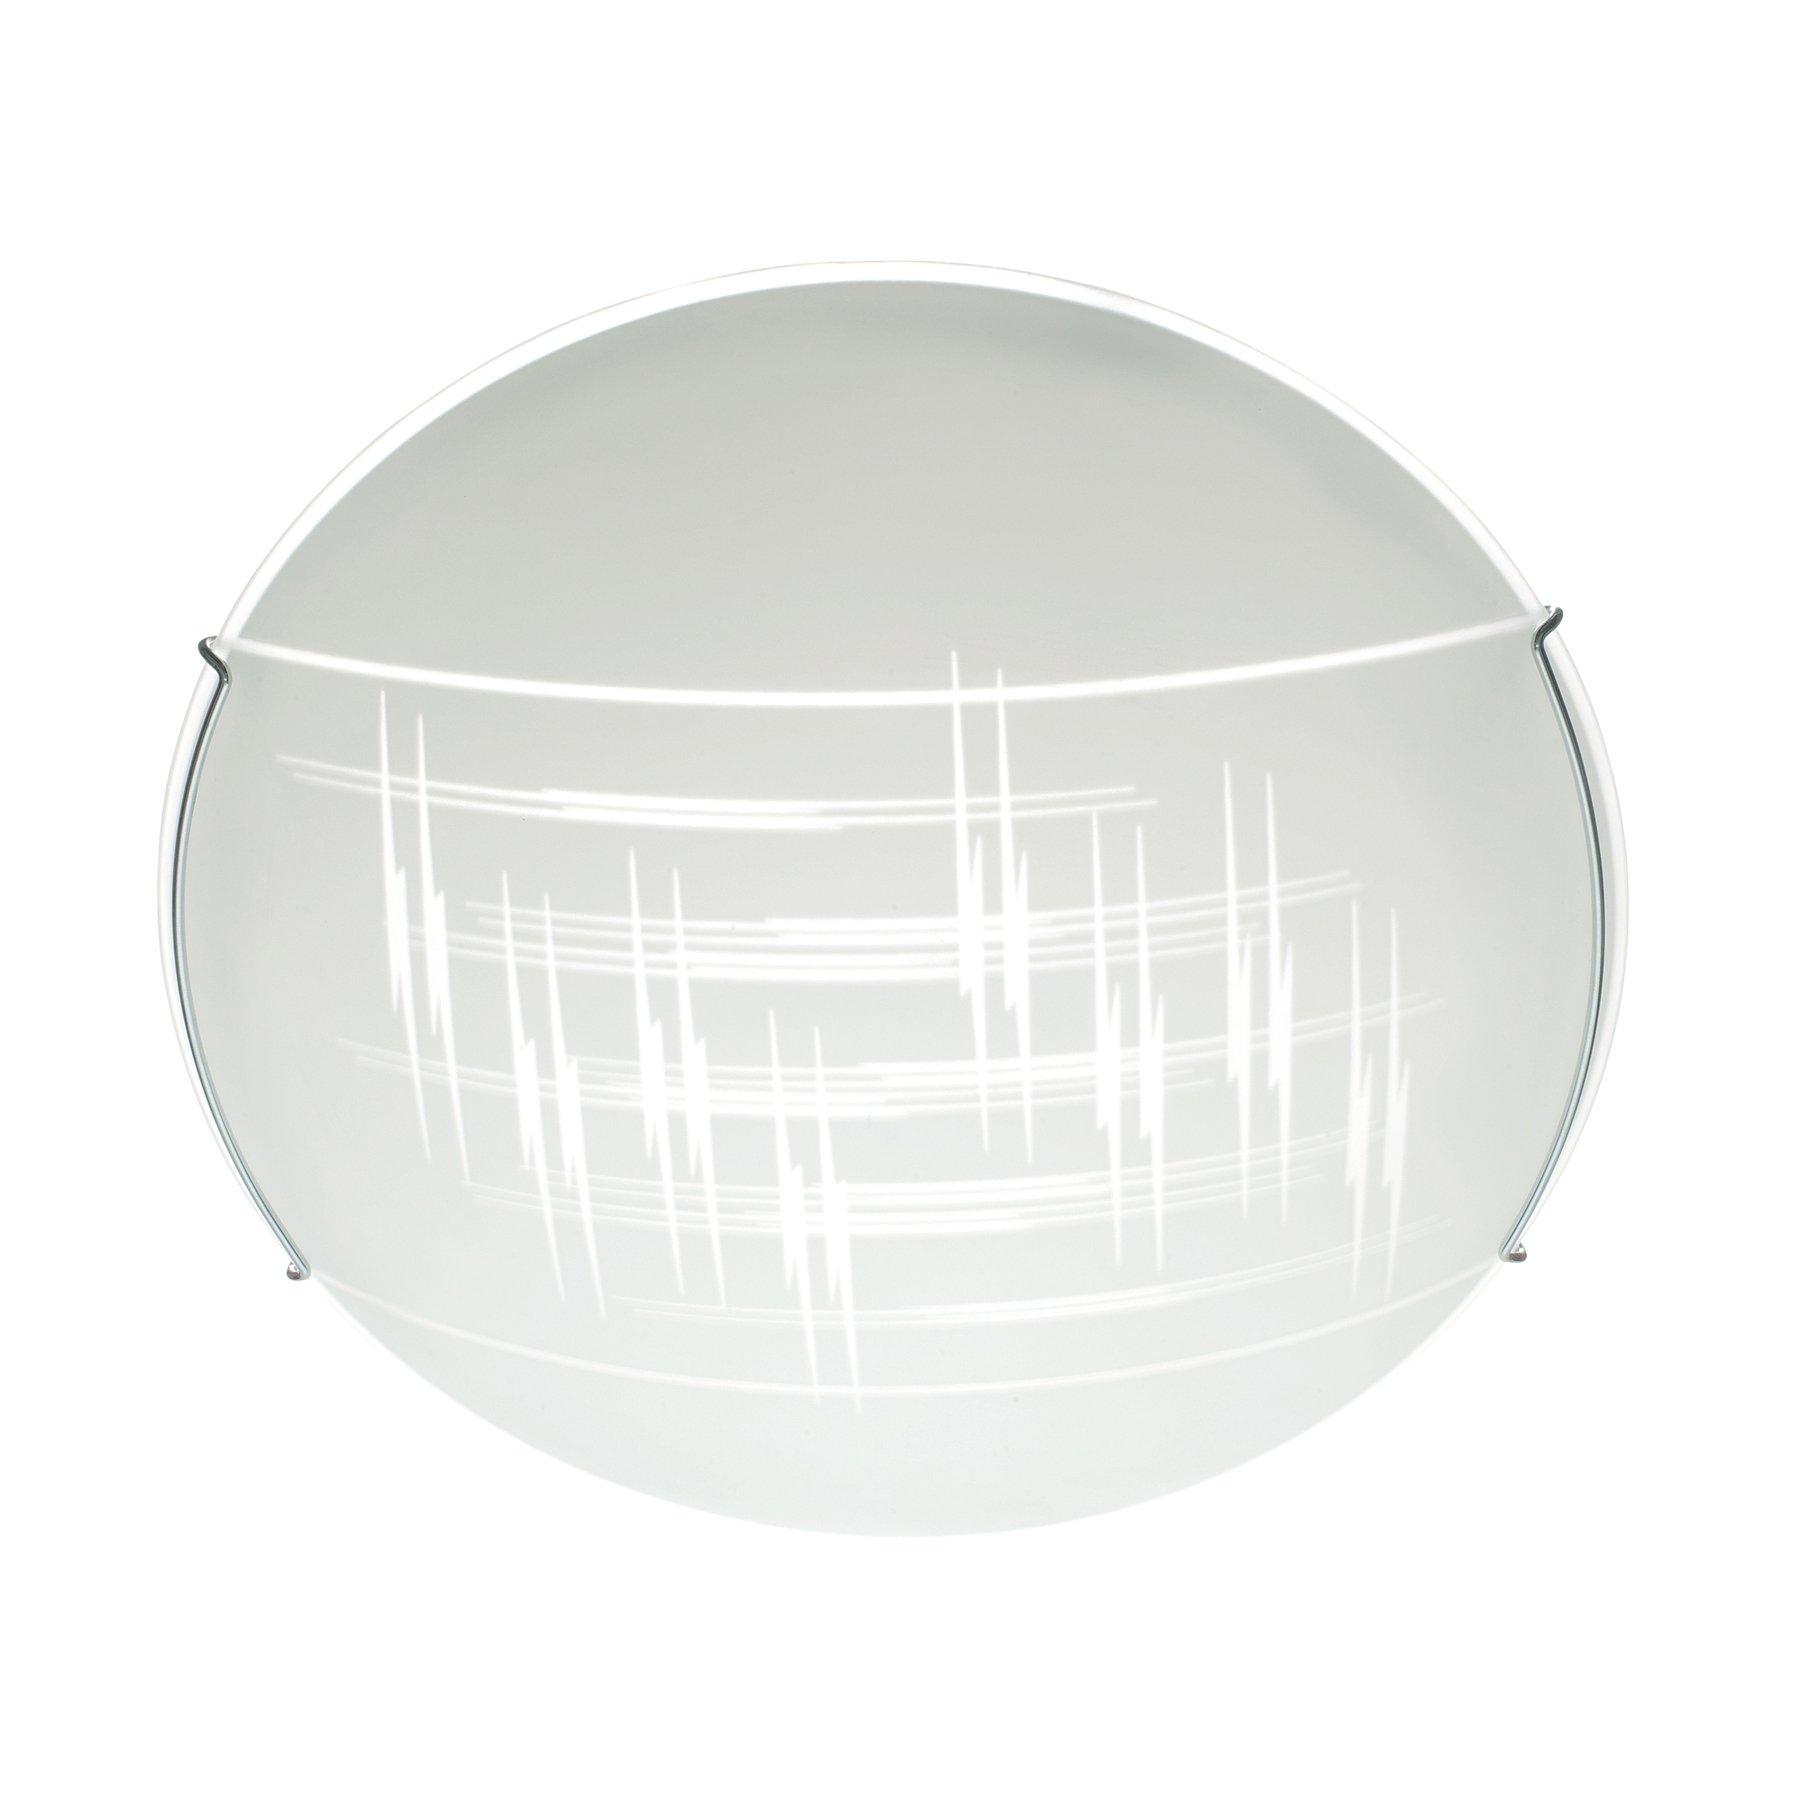 Taklampe Scratch av glass, Ø 40 cm